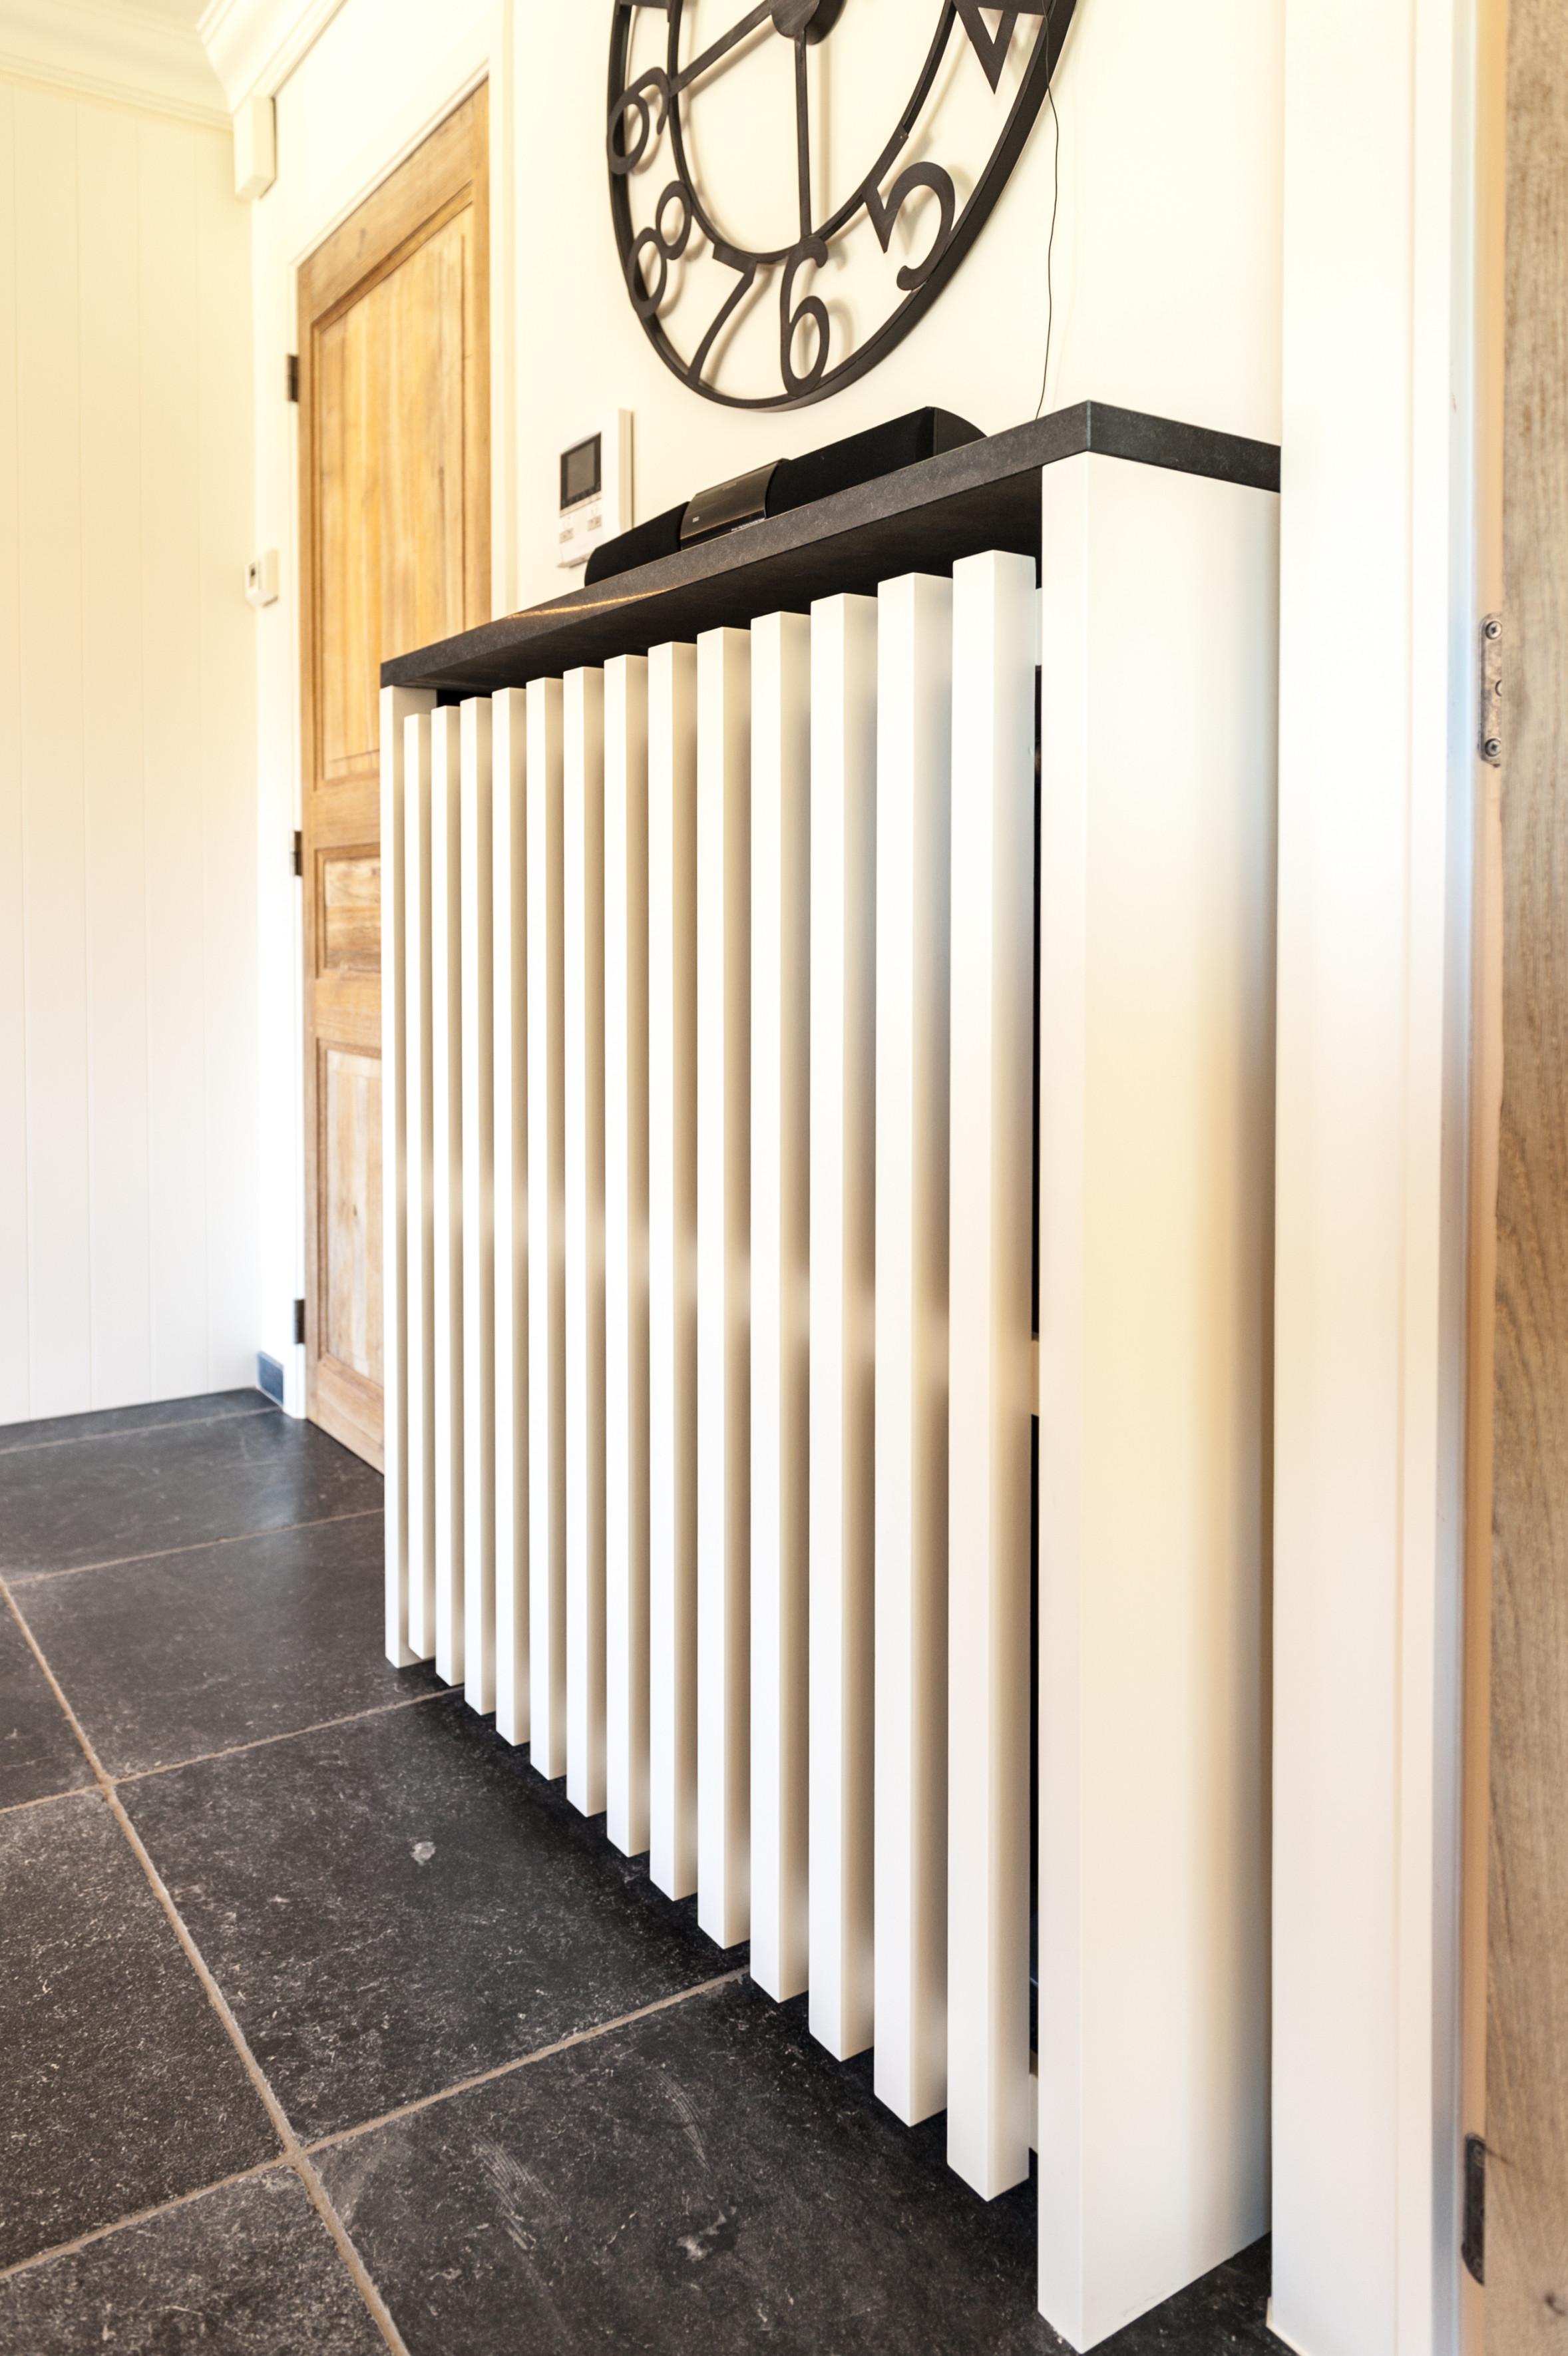 14 verwarming omkasting landelijk.jpg